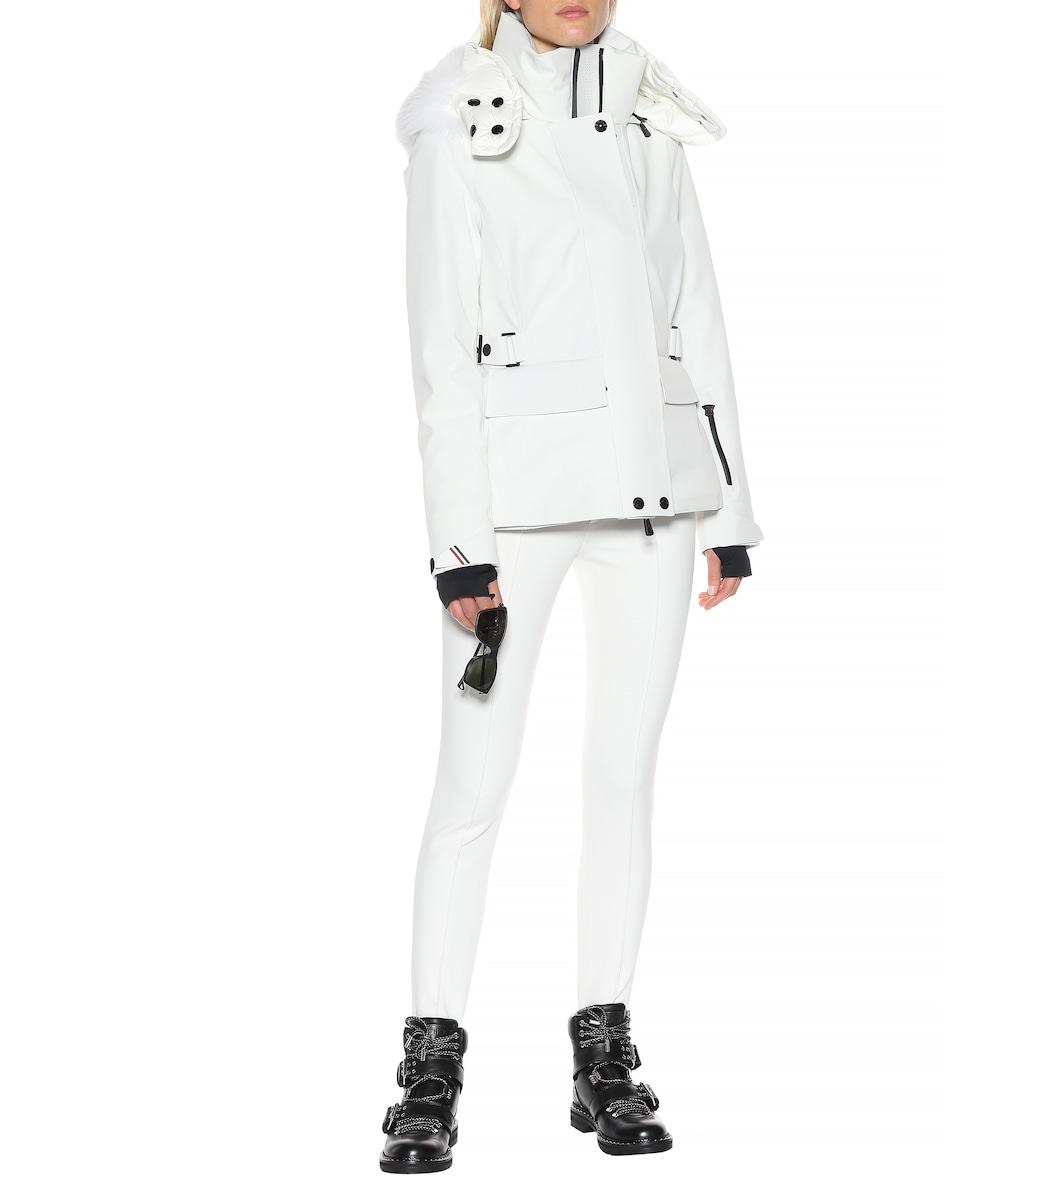 8e3e8037f Moncler Grenoble - Entova down ski jacket   Mytheresa